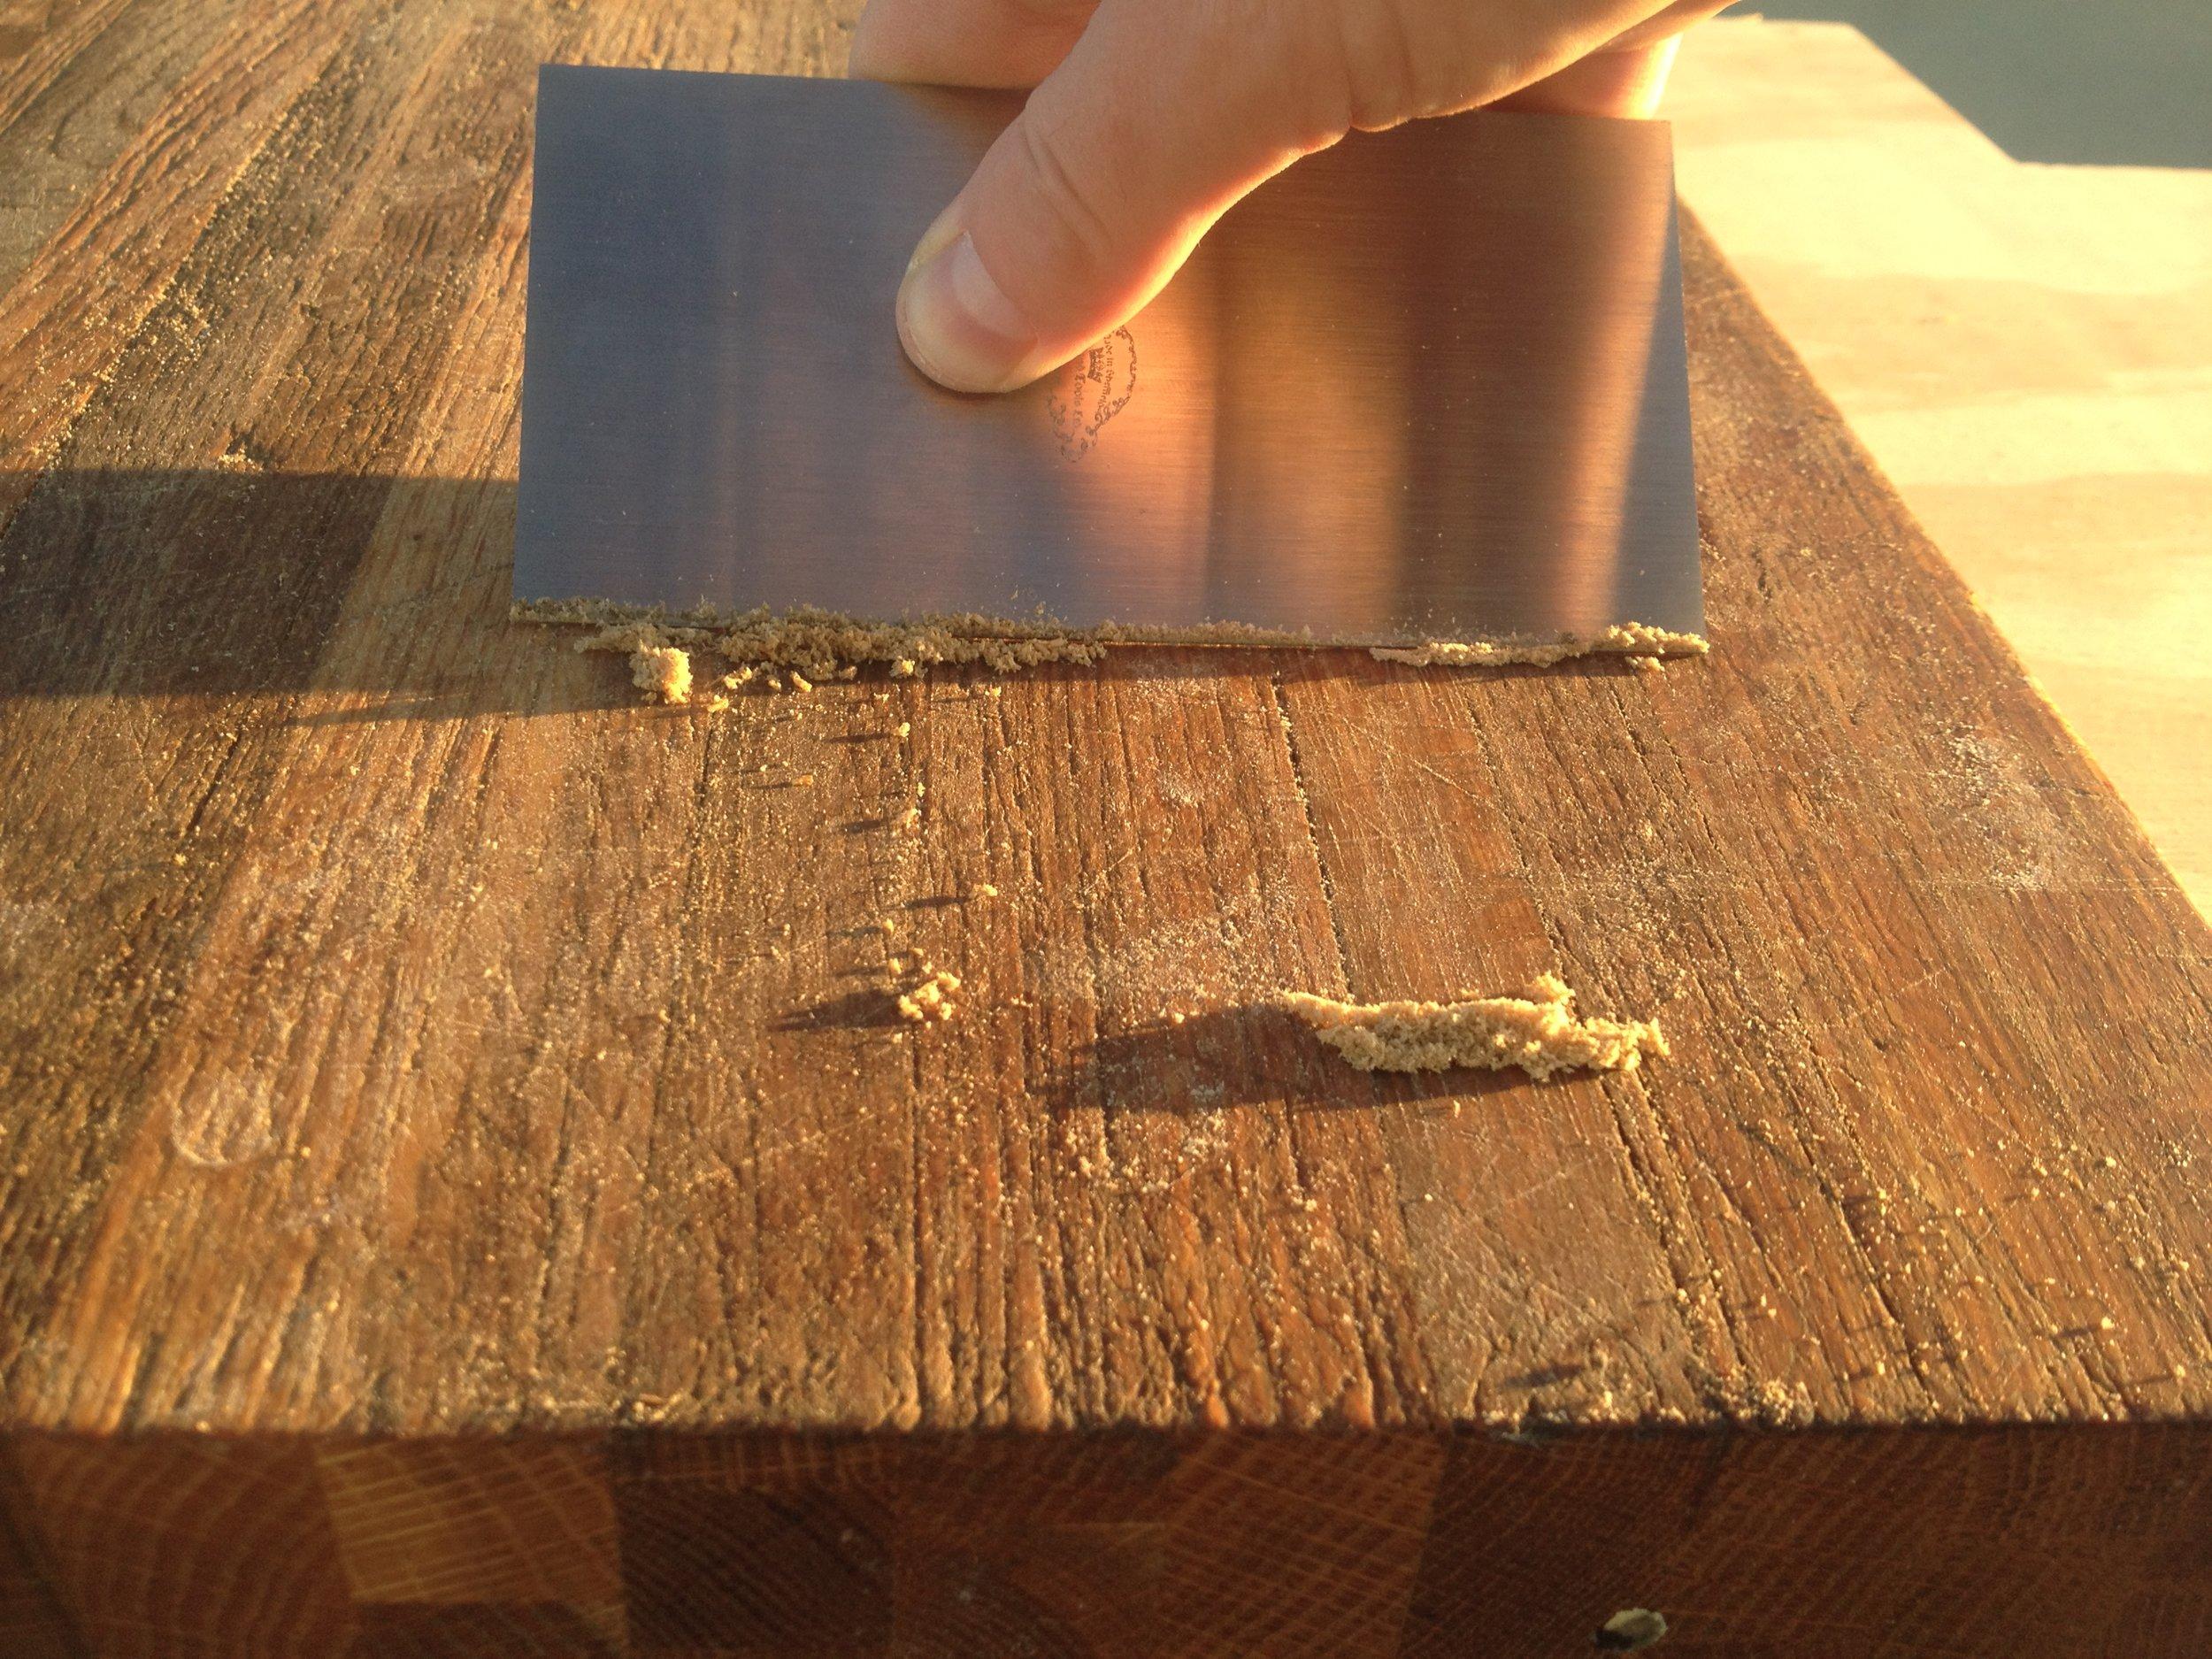 cutting-board-restoration-in-progress-1.jpg